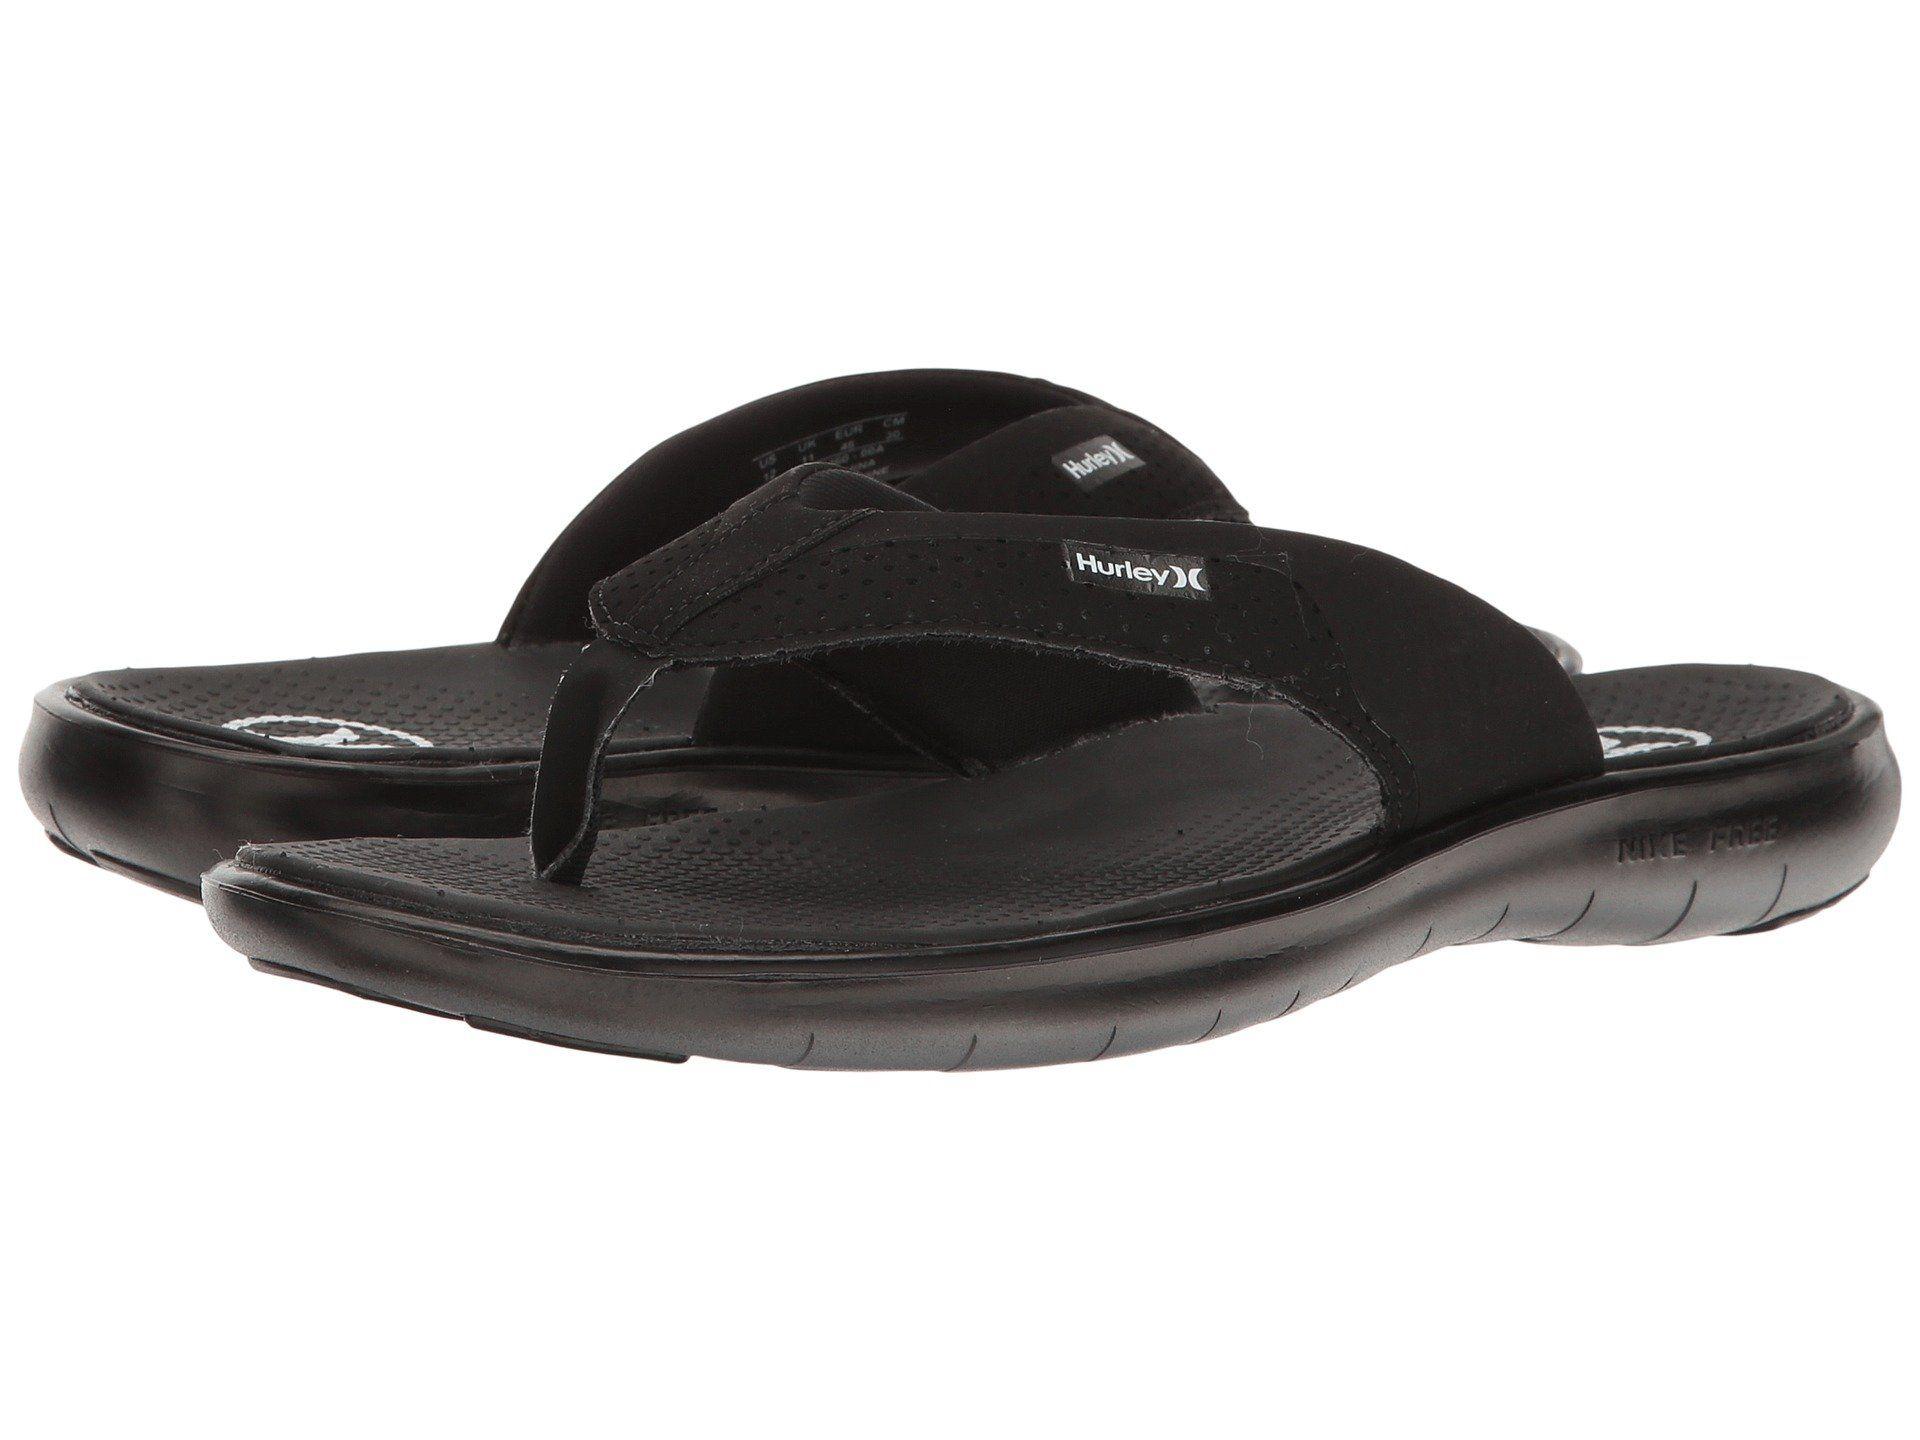 8f29a32bc49c HURLEY Phantom Free Motion Sandal  17.  hurley  shoes